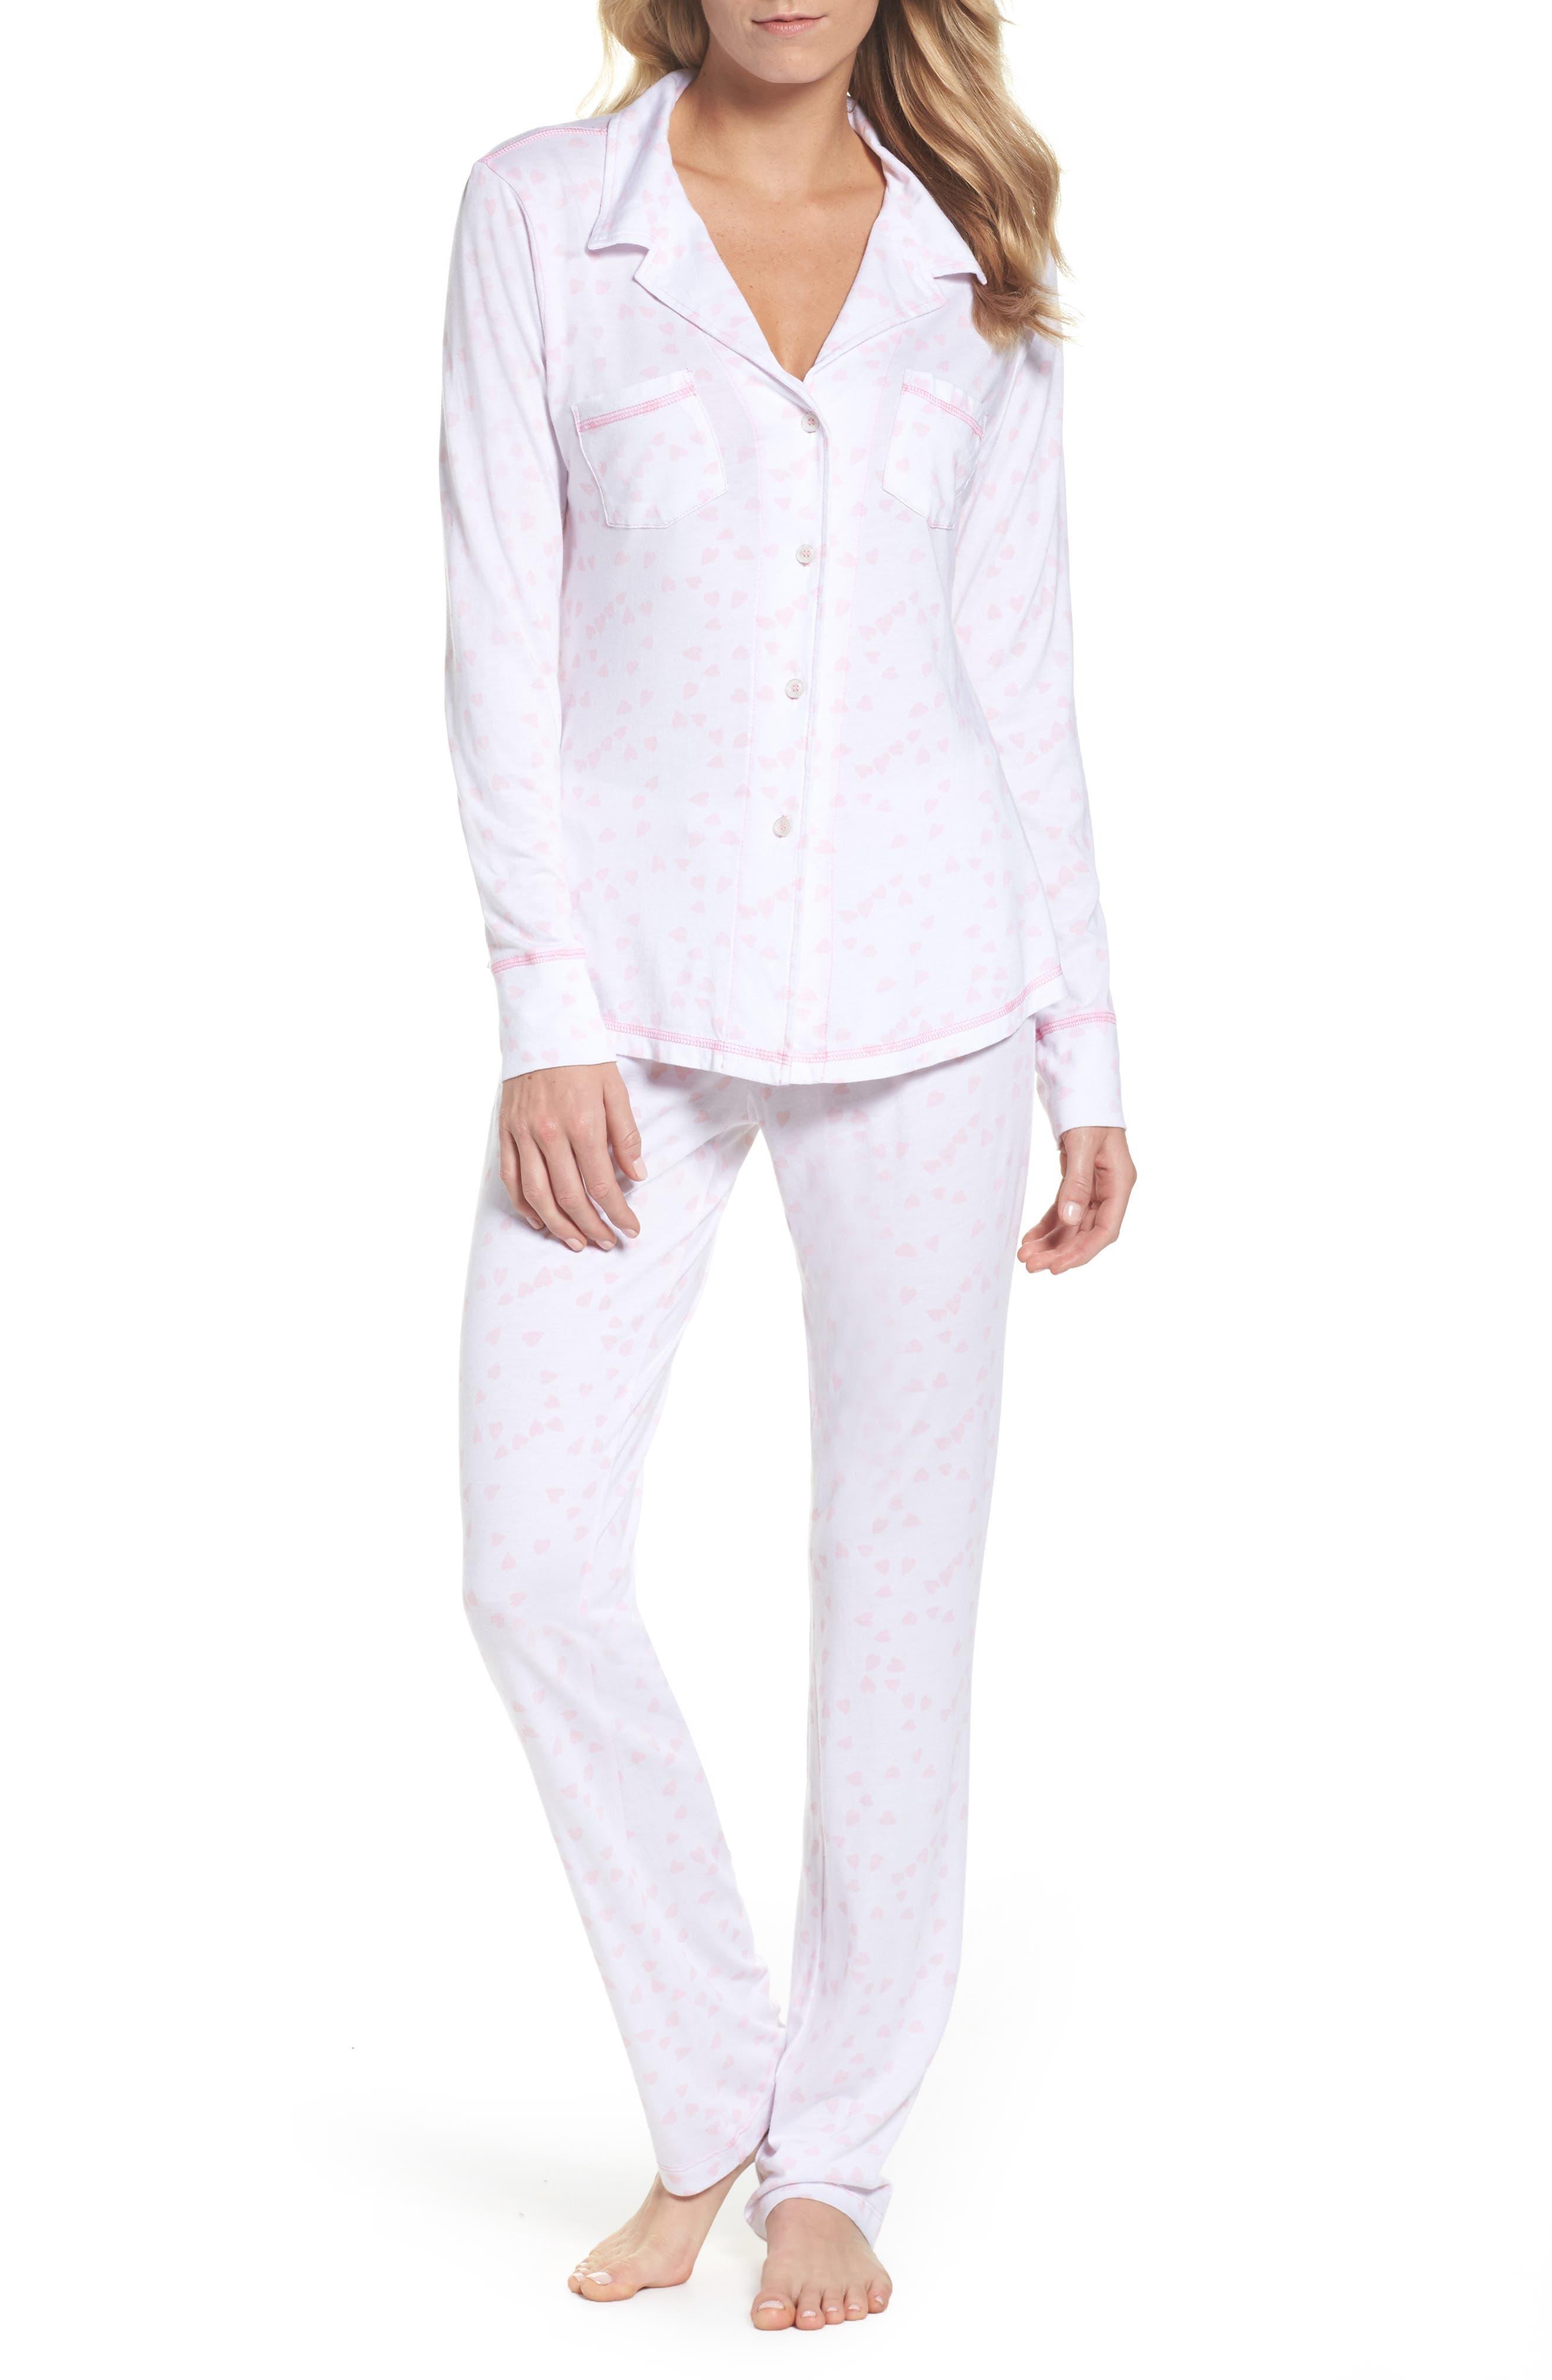 Cassie Pajamas,                         Main,                         color, 650